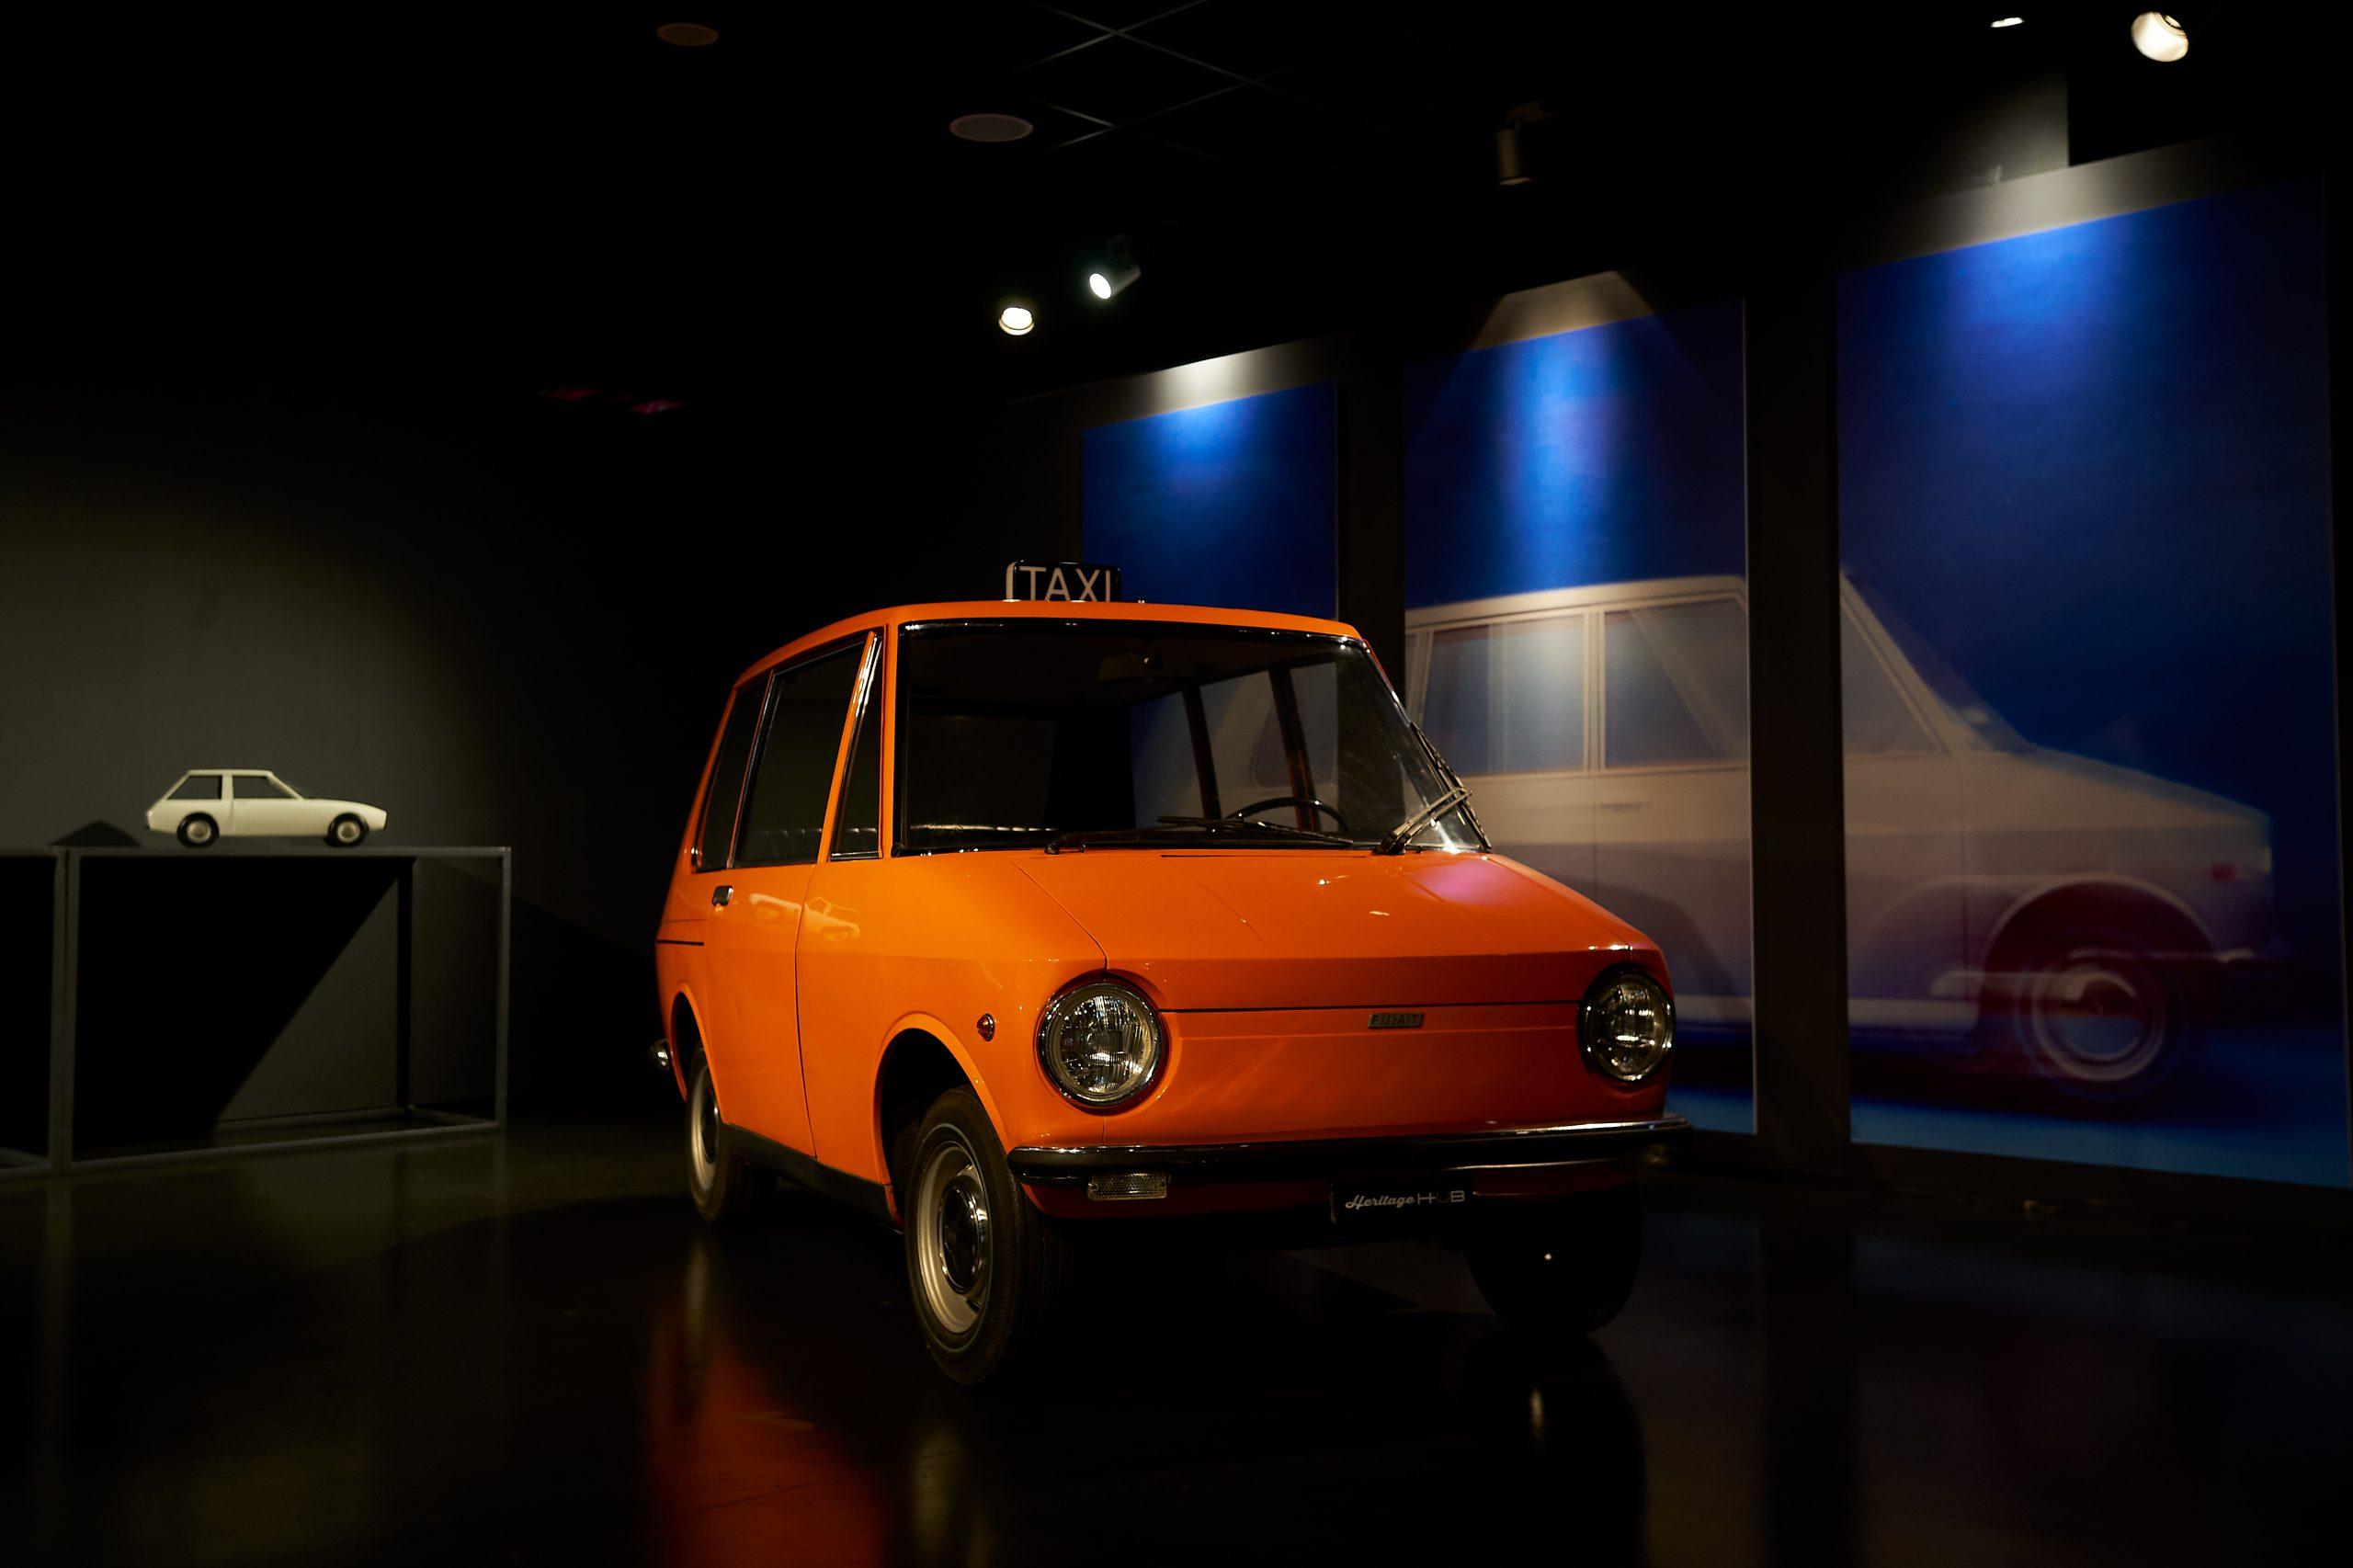 01 Fiat City Taxi scaled H Fiat, o ιδιοφυής σχεδιαστής και ένα περίεργο ταξί Fiat, retro, ειδήσεις, Νέα